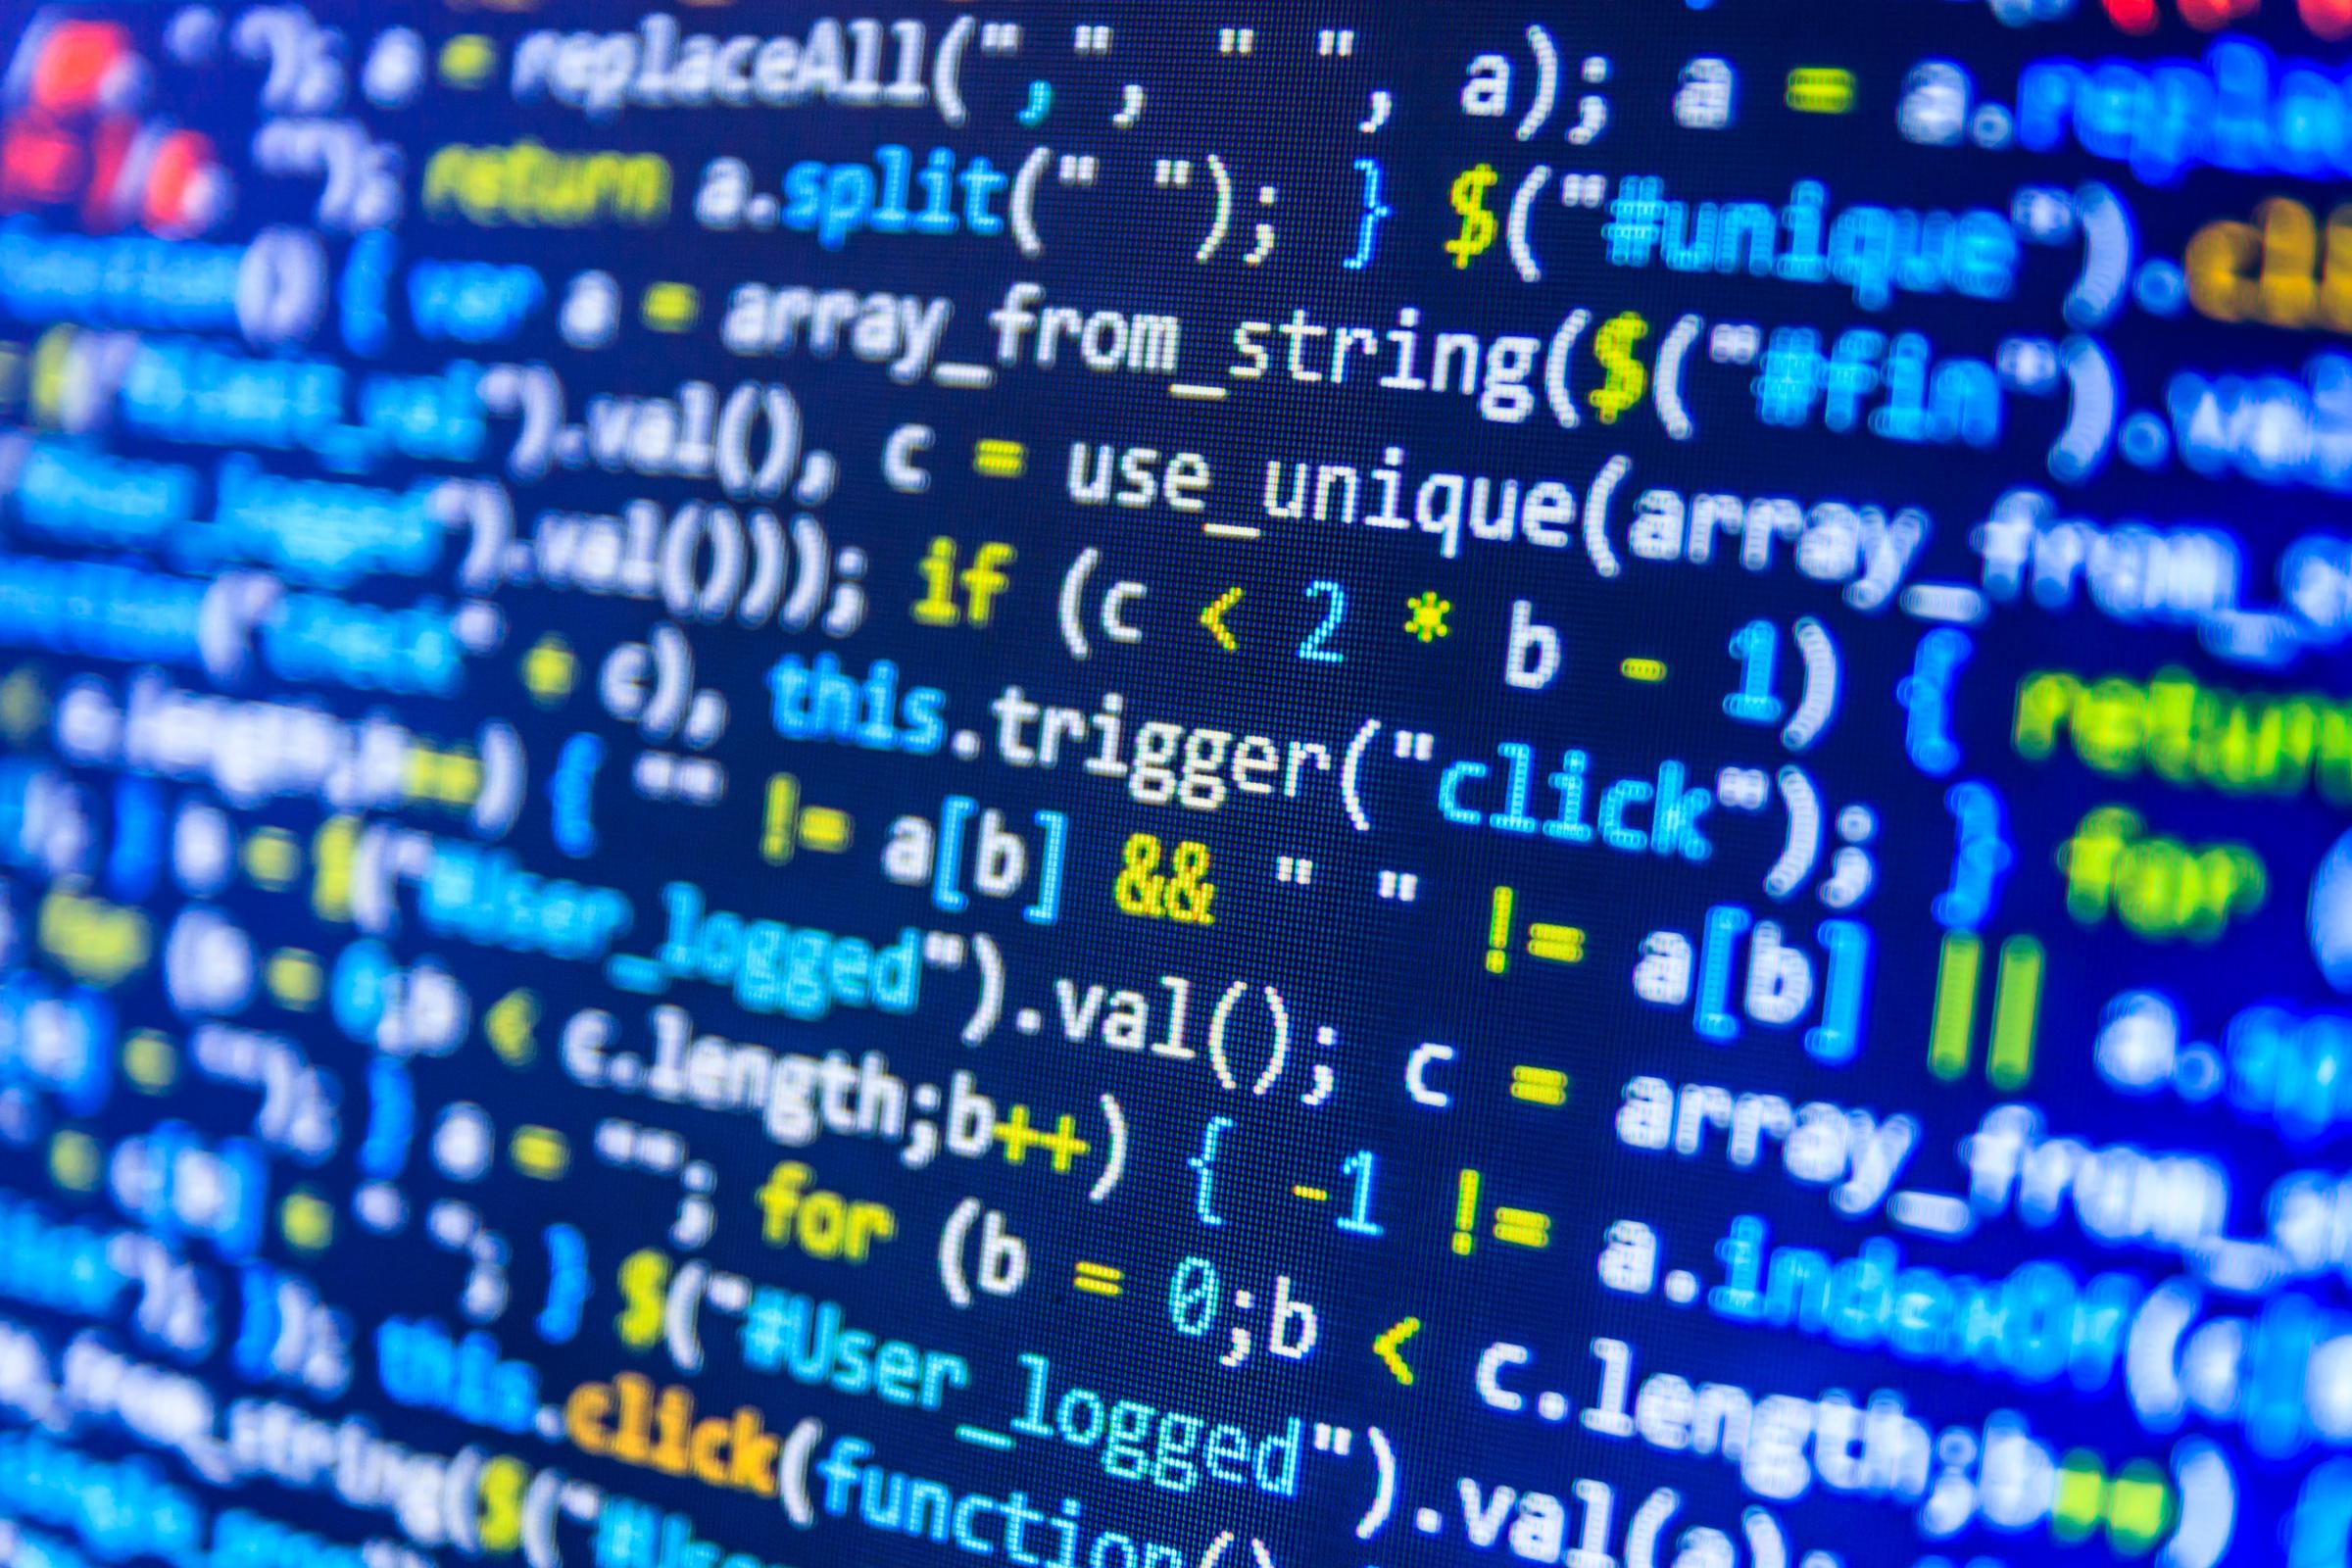 Jesse Feiler - Coding | WAMC